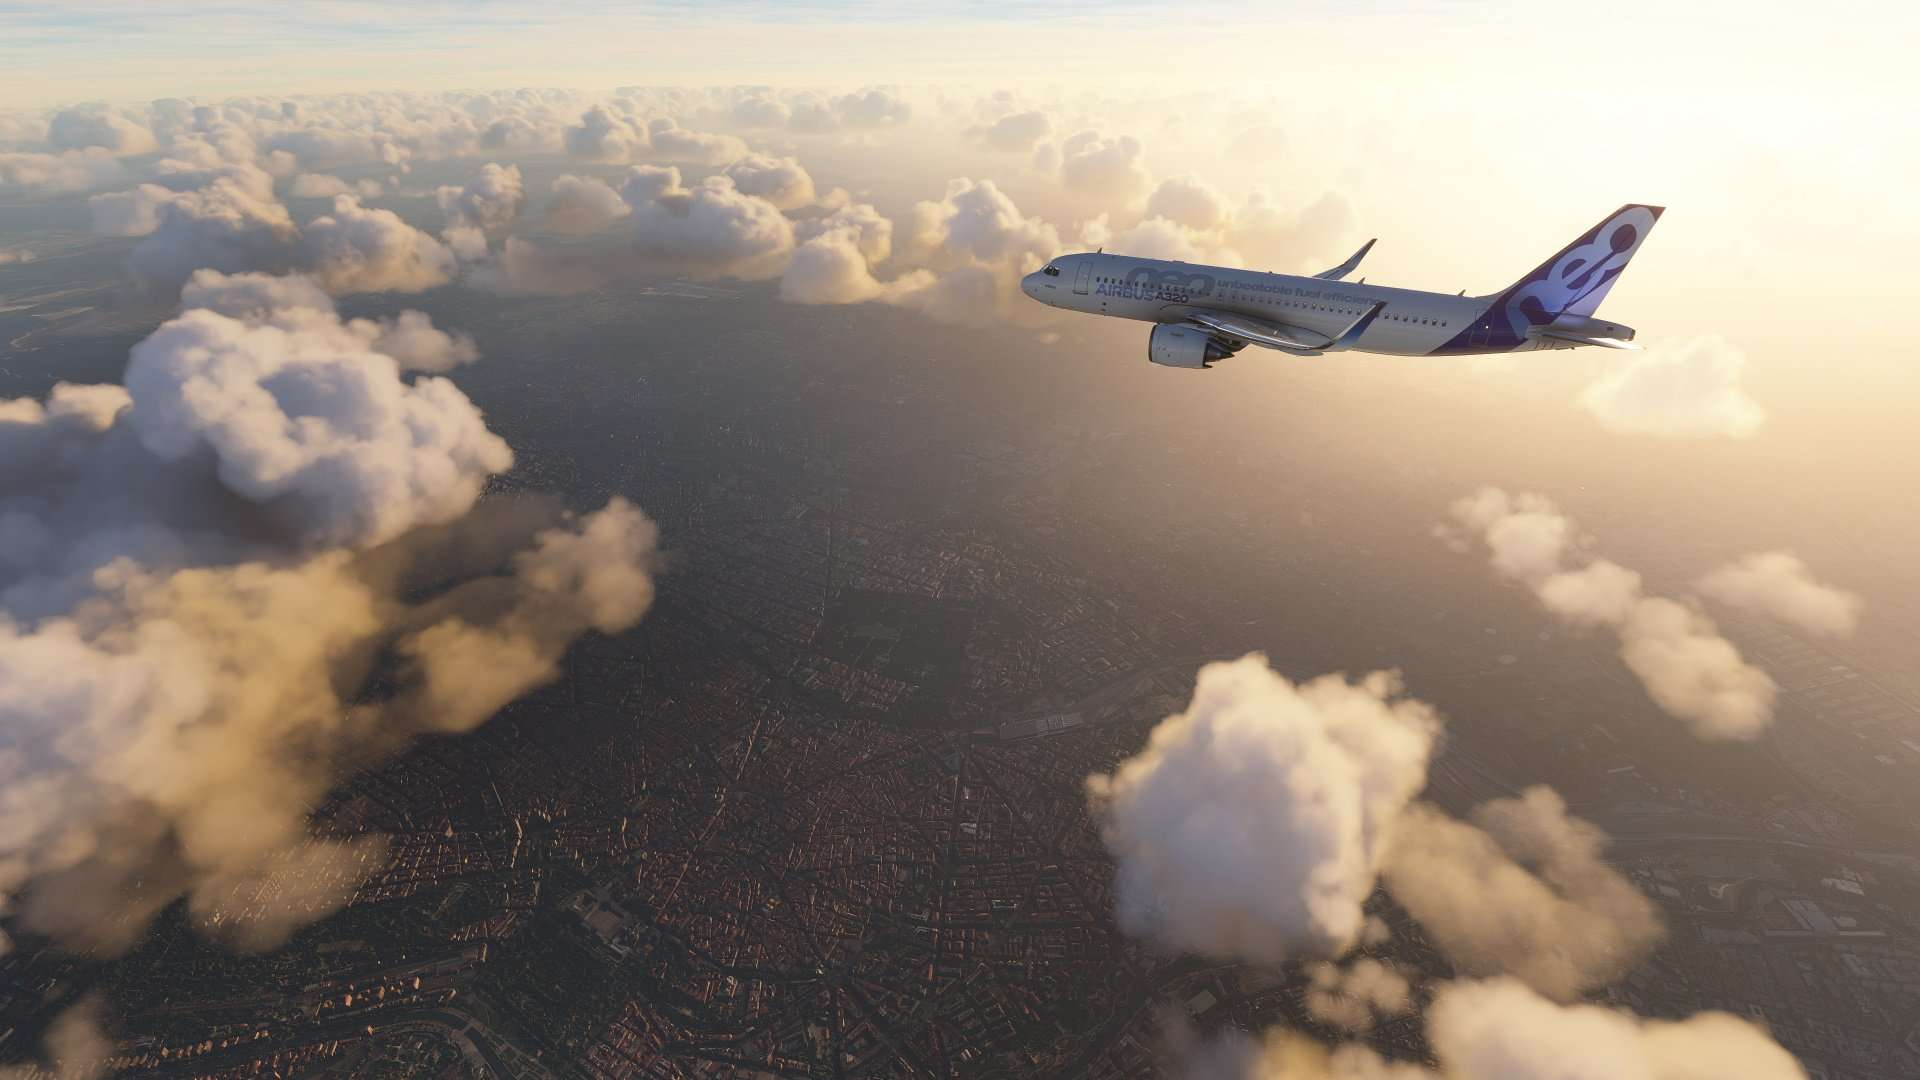 flightsim_screen2